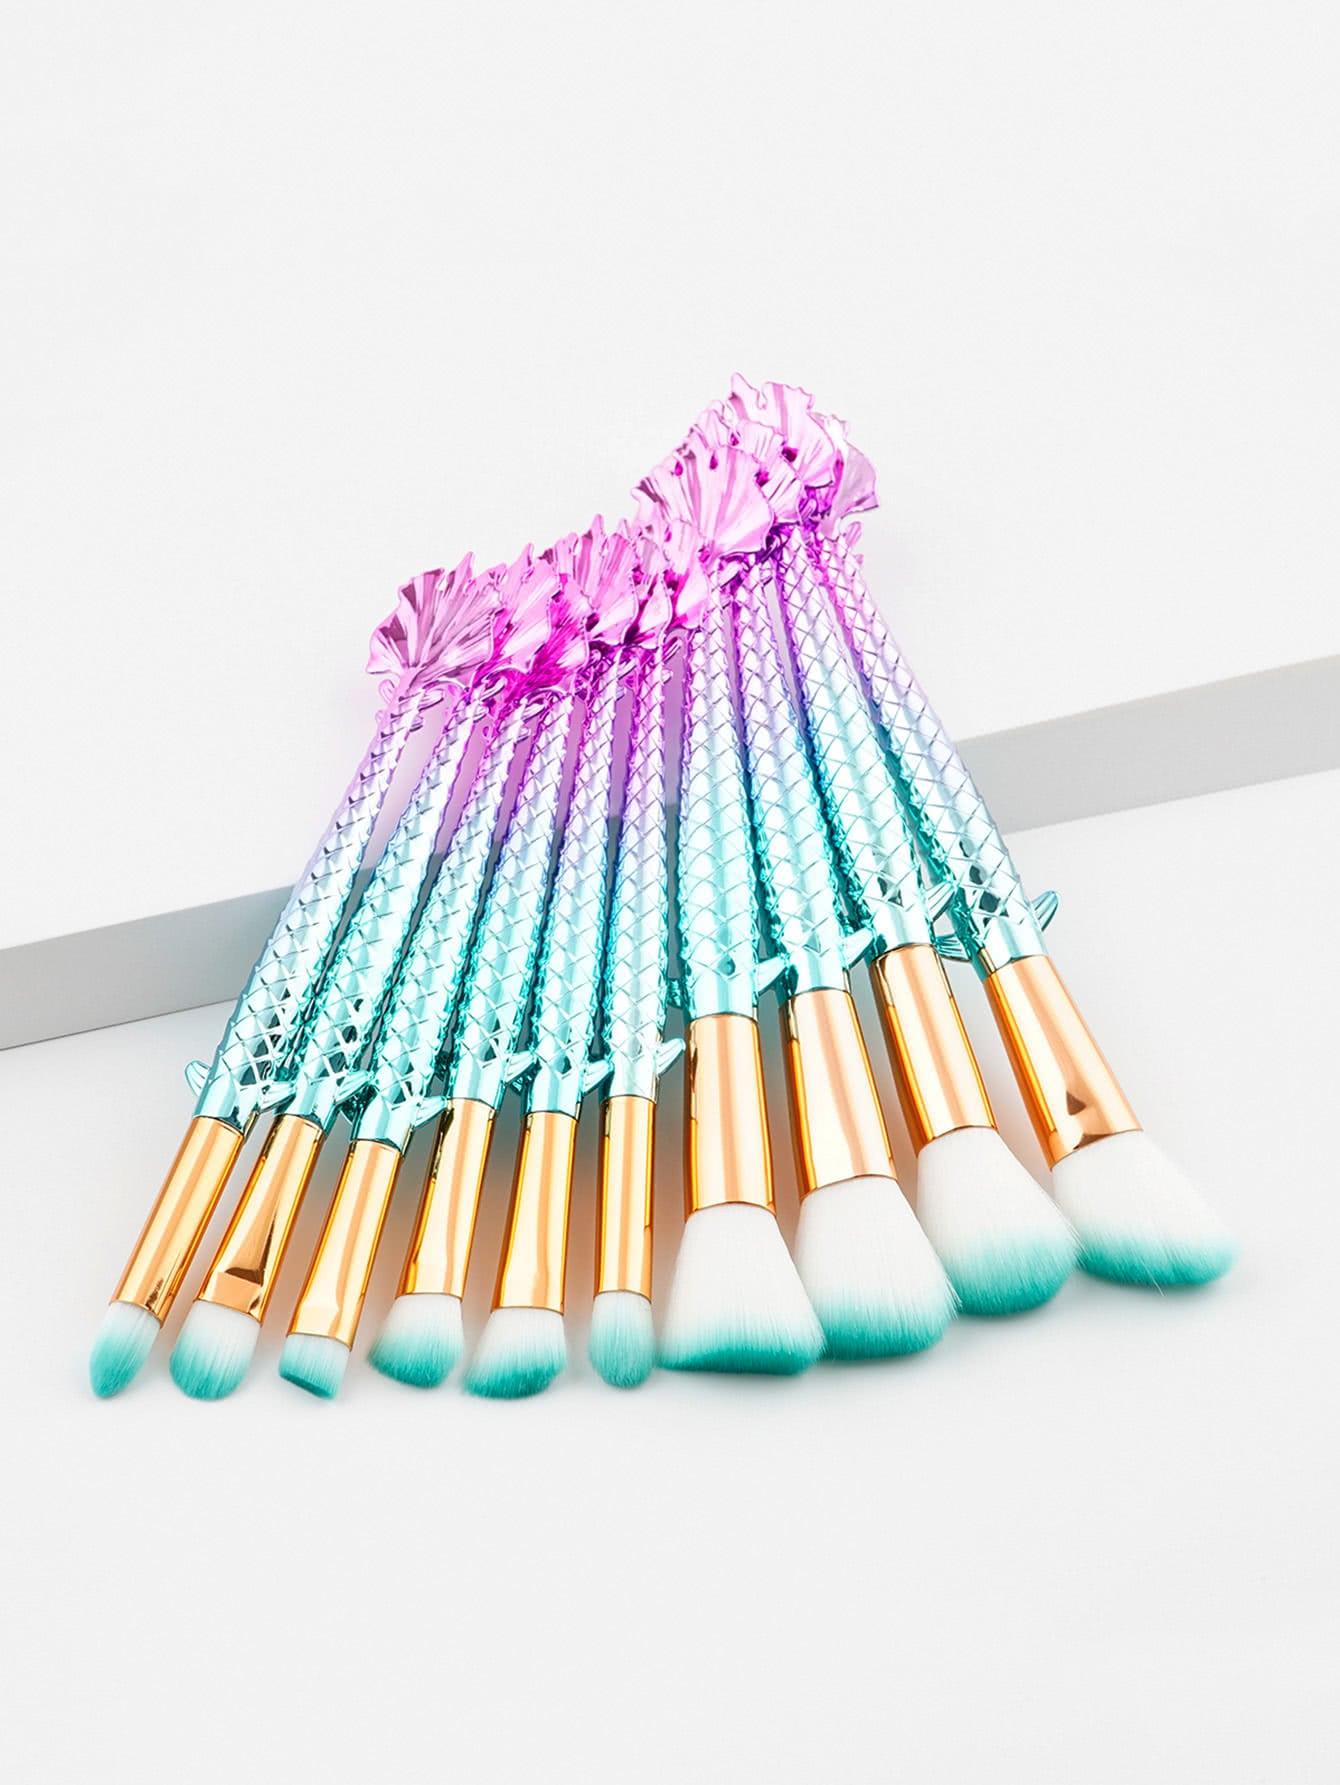 все цены на Ombre Handle Makeup Brush Set 10pcs онлайн